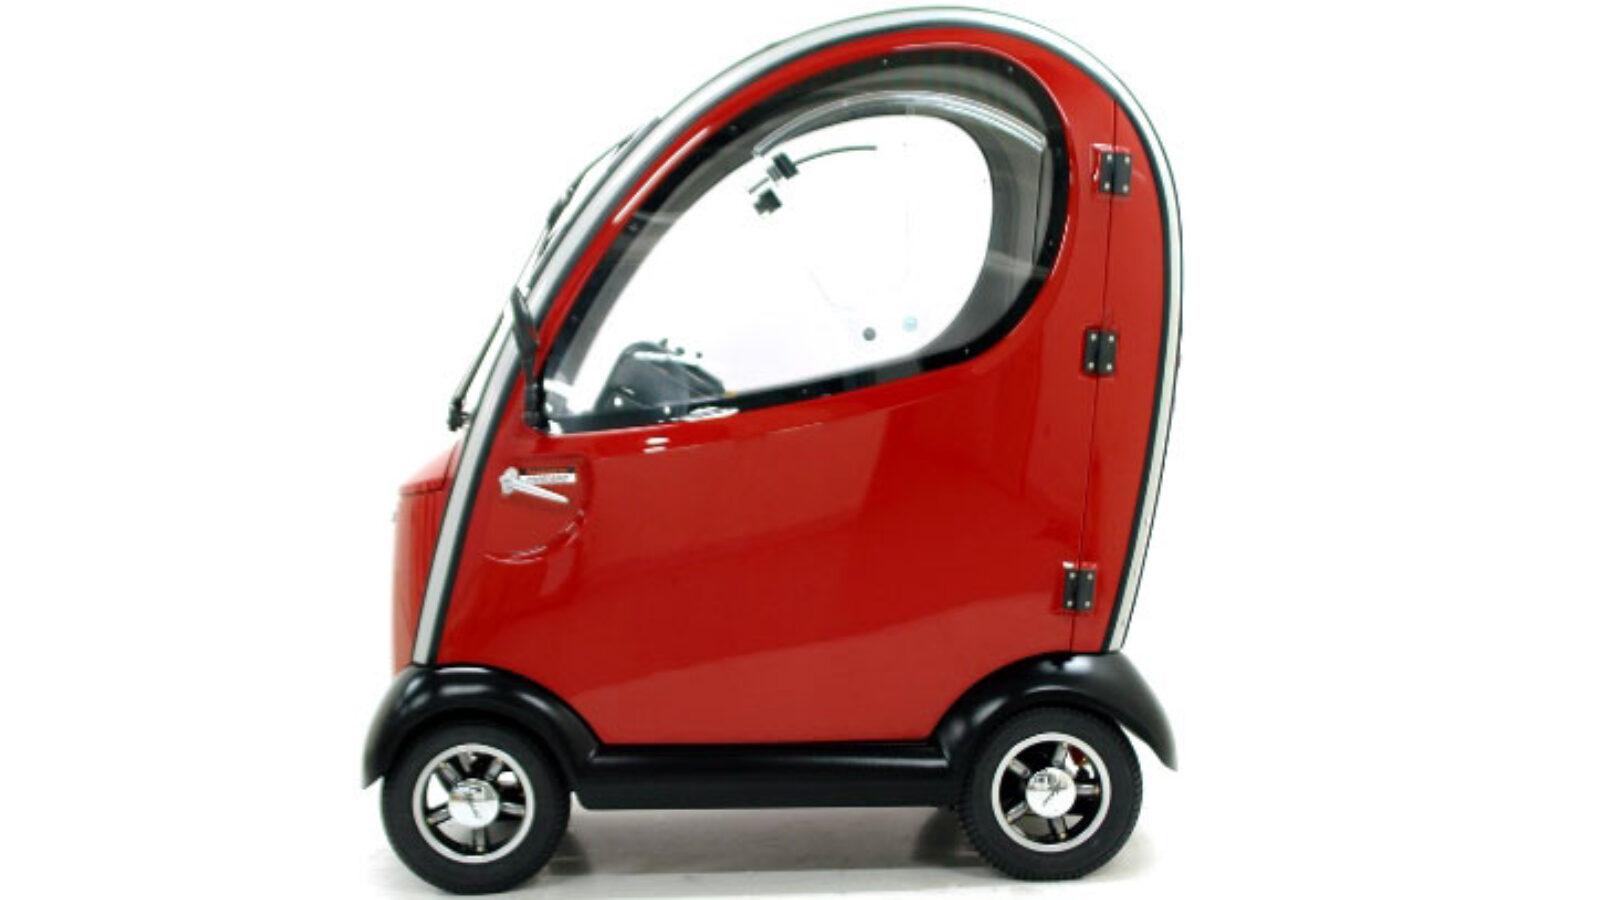 elektromobil-liebke-em-p700-4